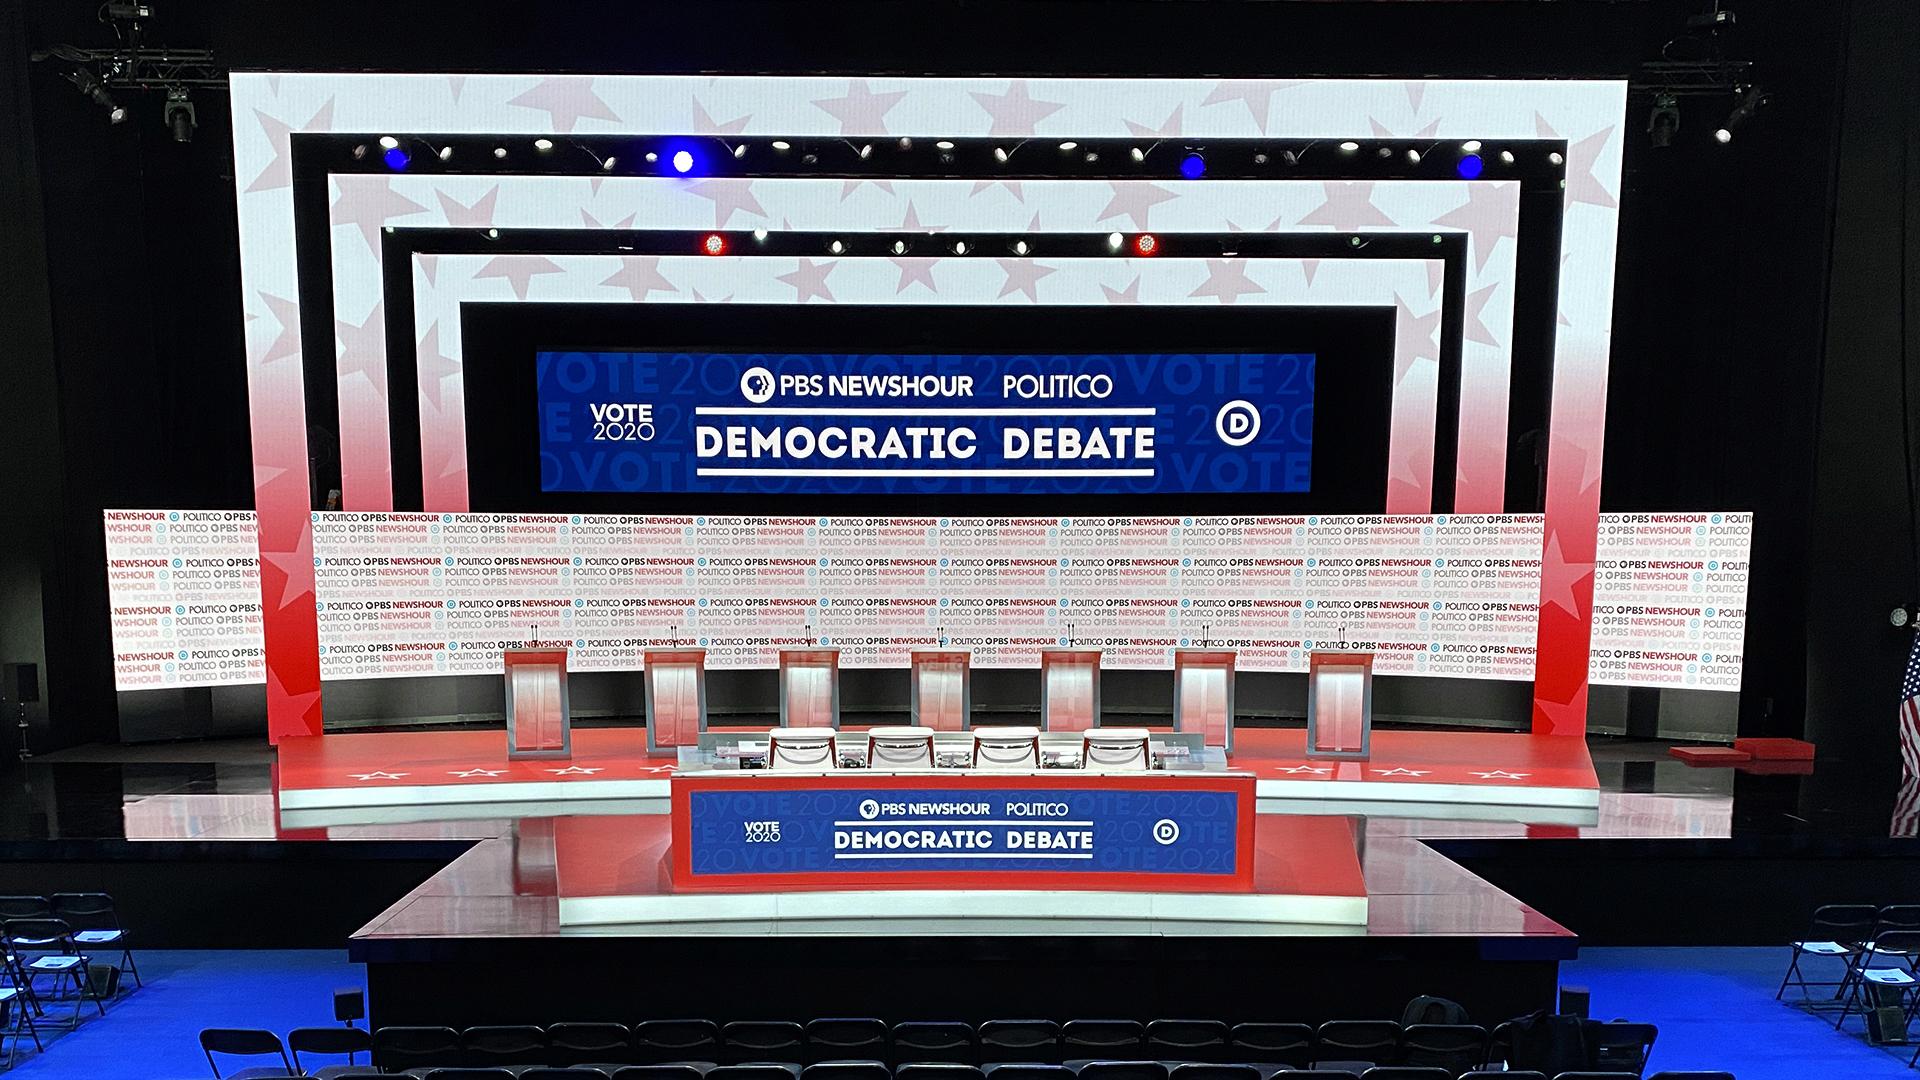 NCS_PBS-NewsHour_Politico_Democratic-Debate_002